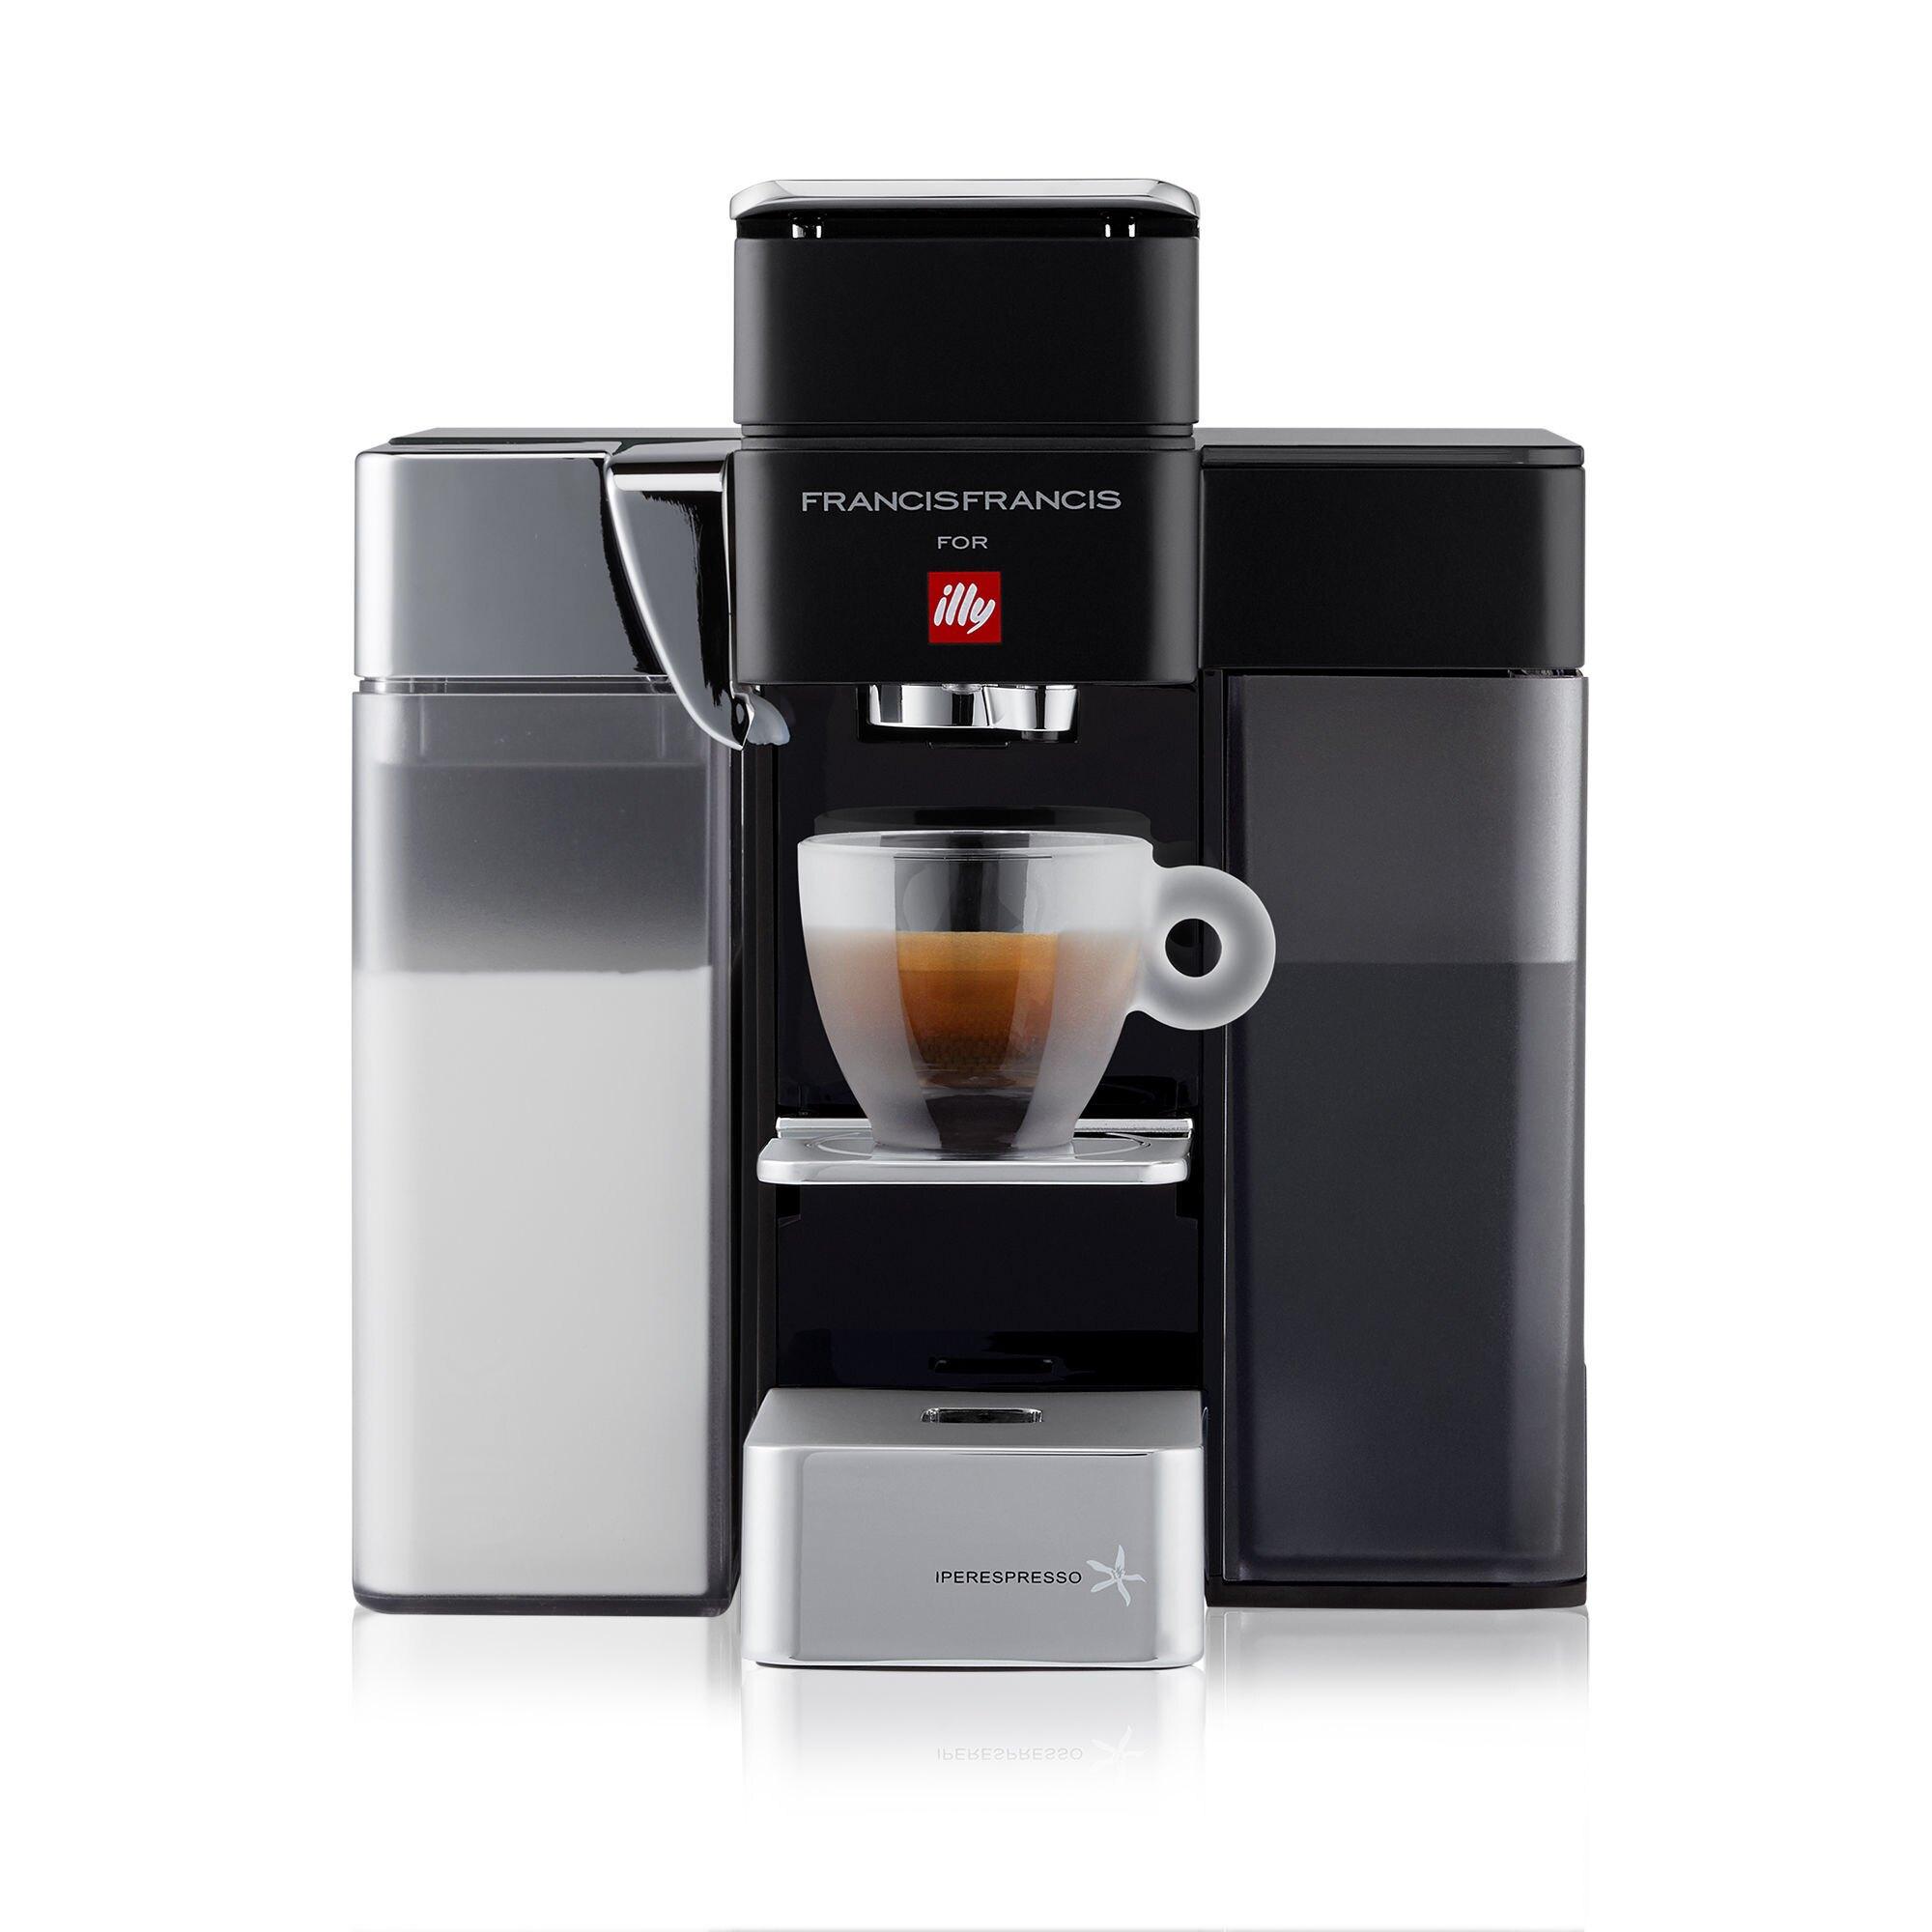 Y5 iperEspresso Milk Espresso & Coffee Machine - illy eShop